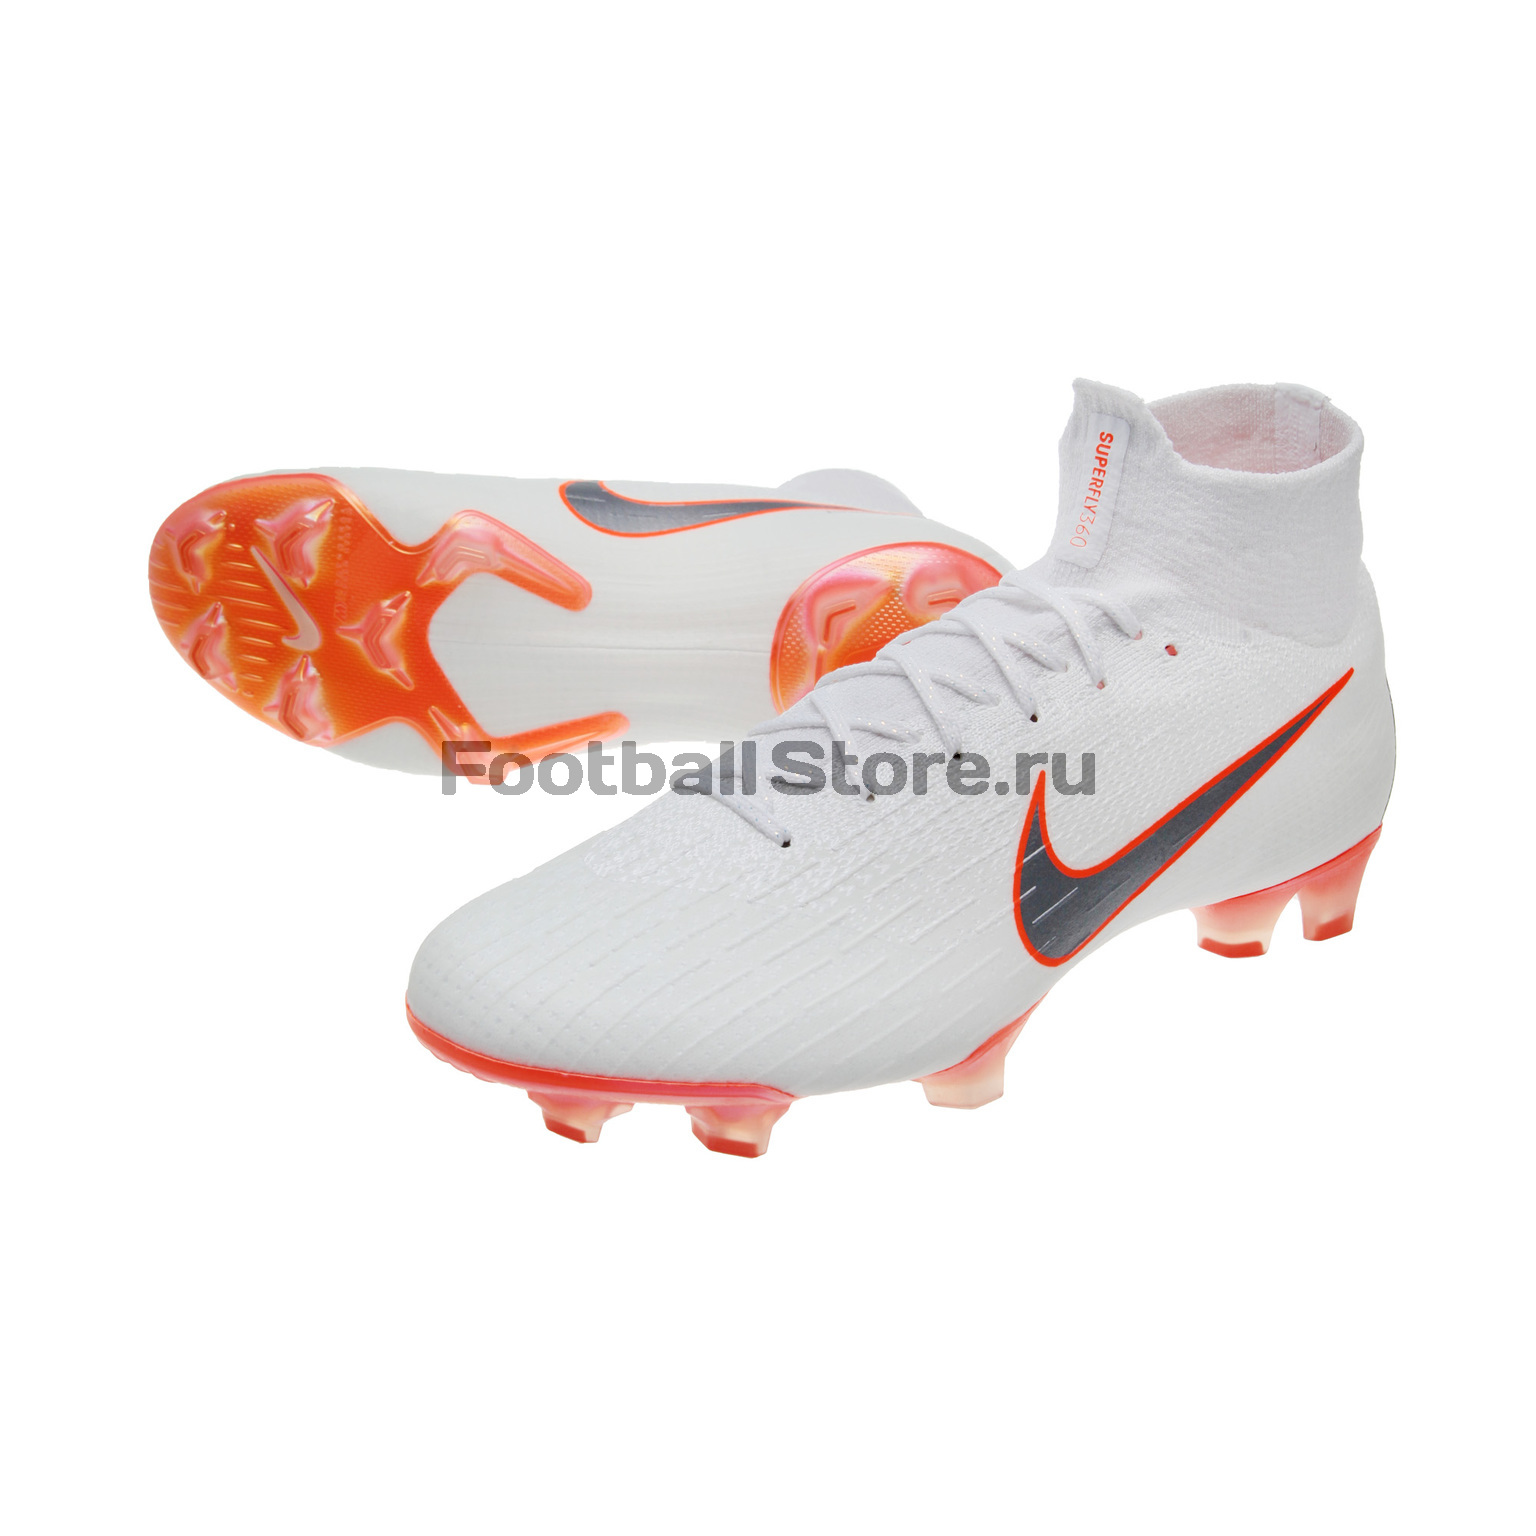 21110aa5 Бутсы Nike Superfly 6 Elite FG AH7365-107 – купить бутсы в интернет ...